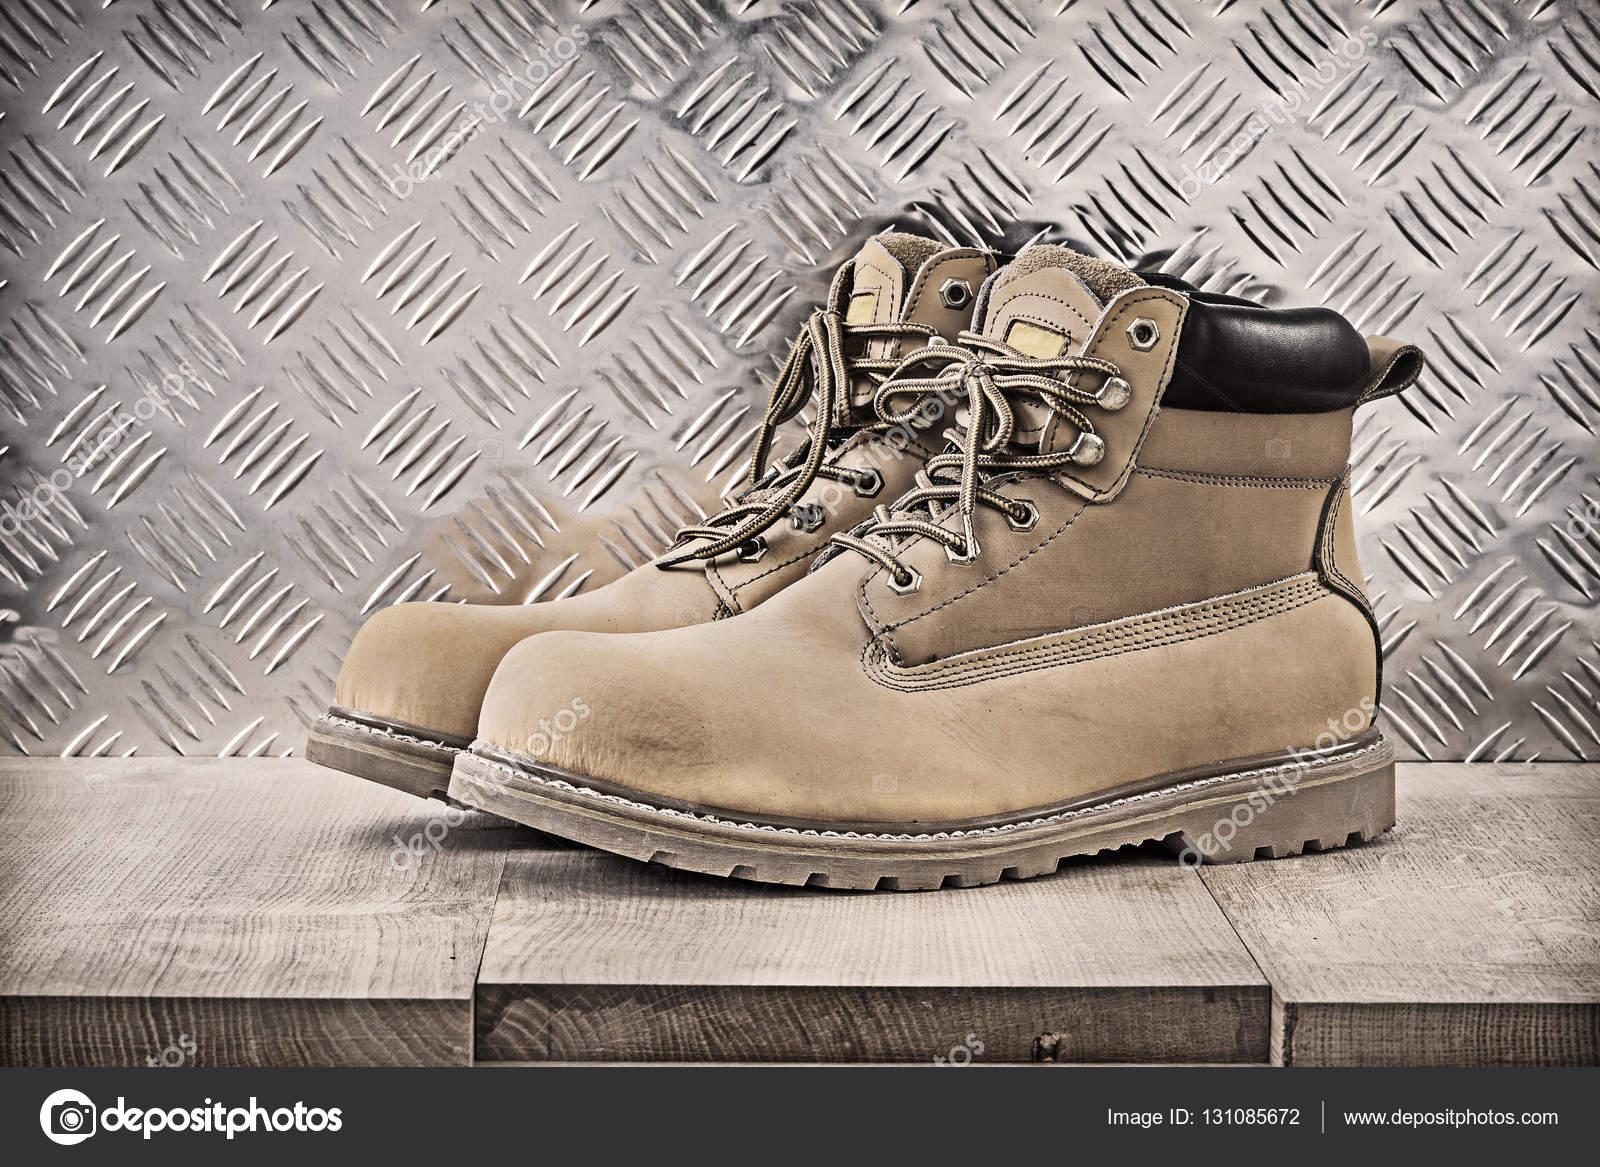 aa0e9b74649 Ζευγάρι μπότες ασφαλείας στην ξύλινη σανίδα και διοχετεύεται λαμαρίνας,  κατασκευαστική αντίληψη — Εικόνα από ...